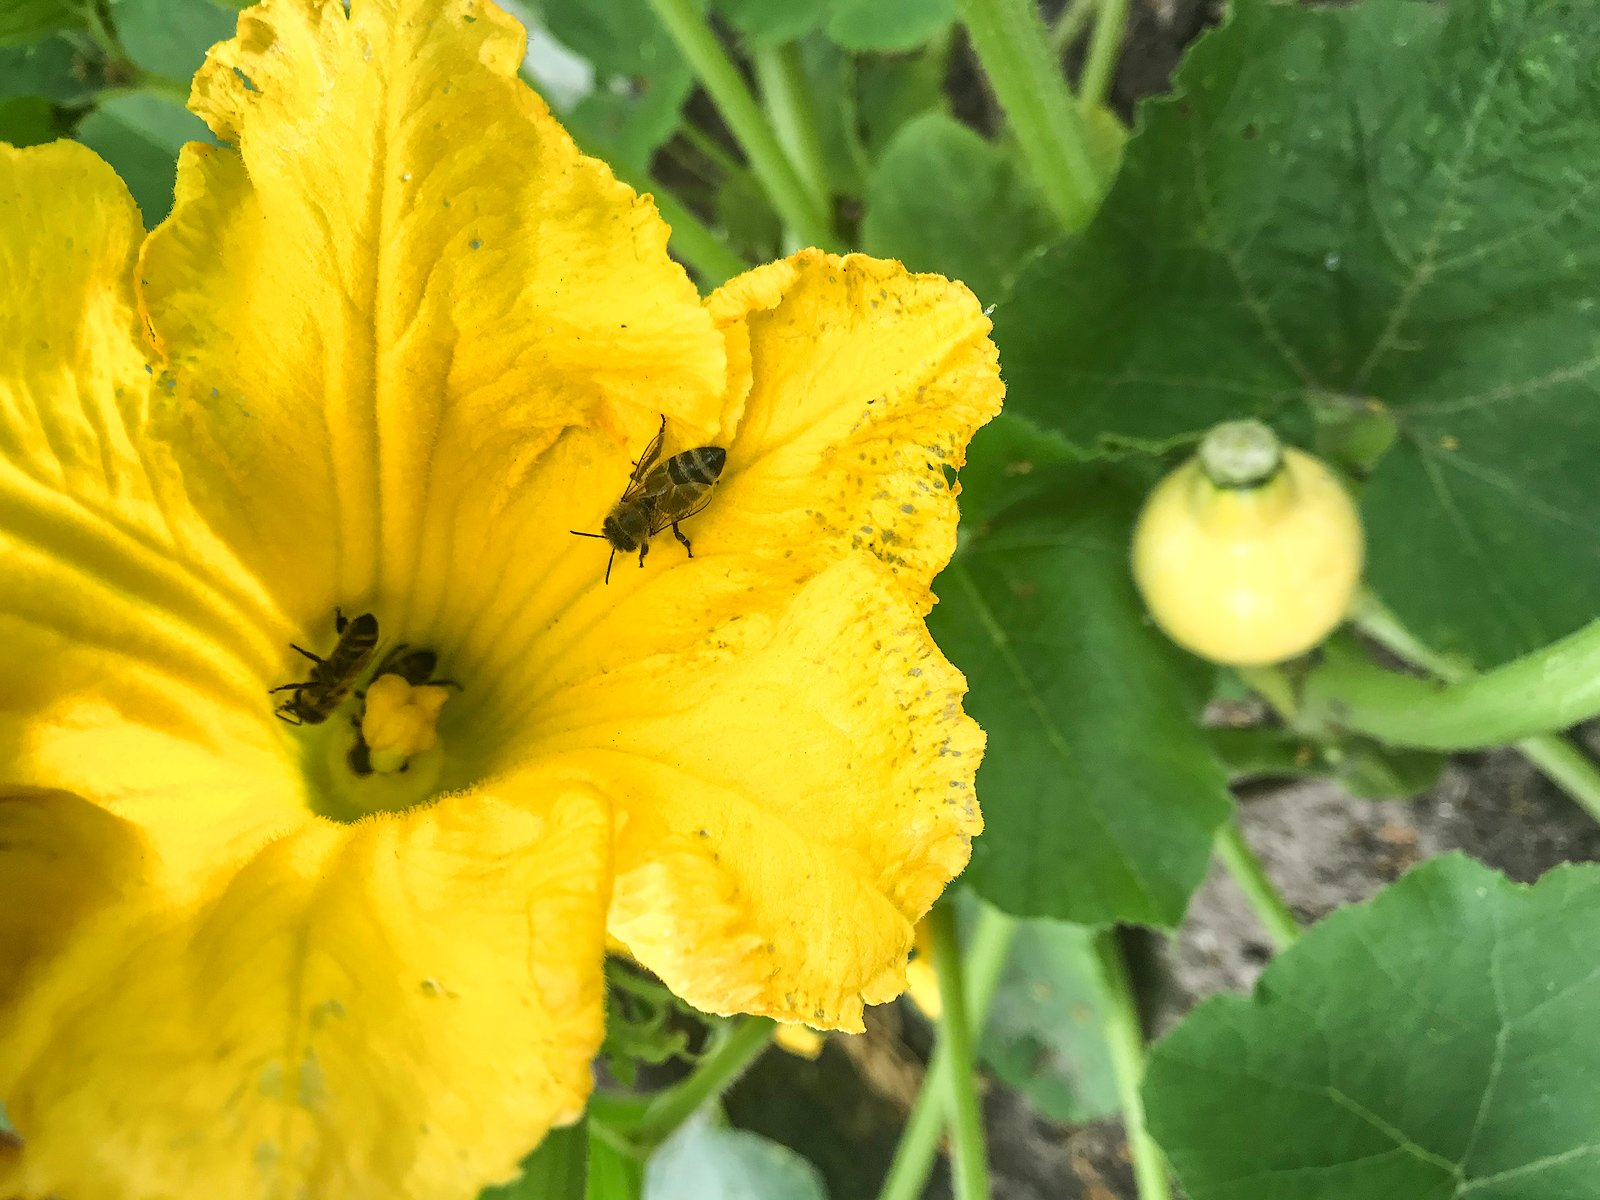 Blumen im Gemüsebeet